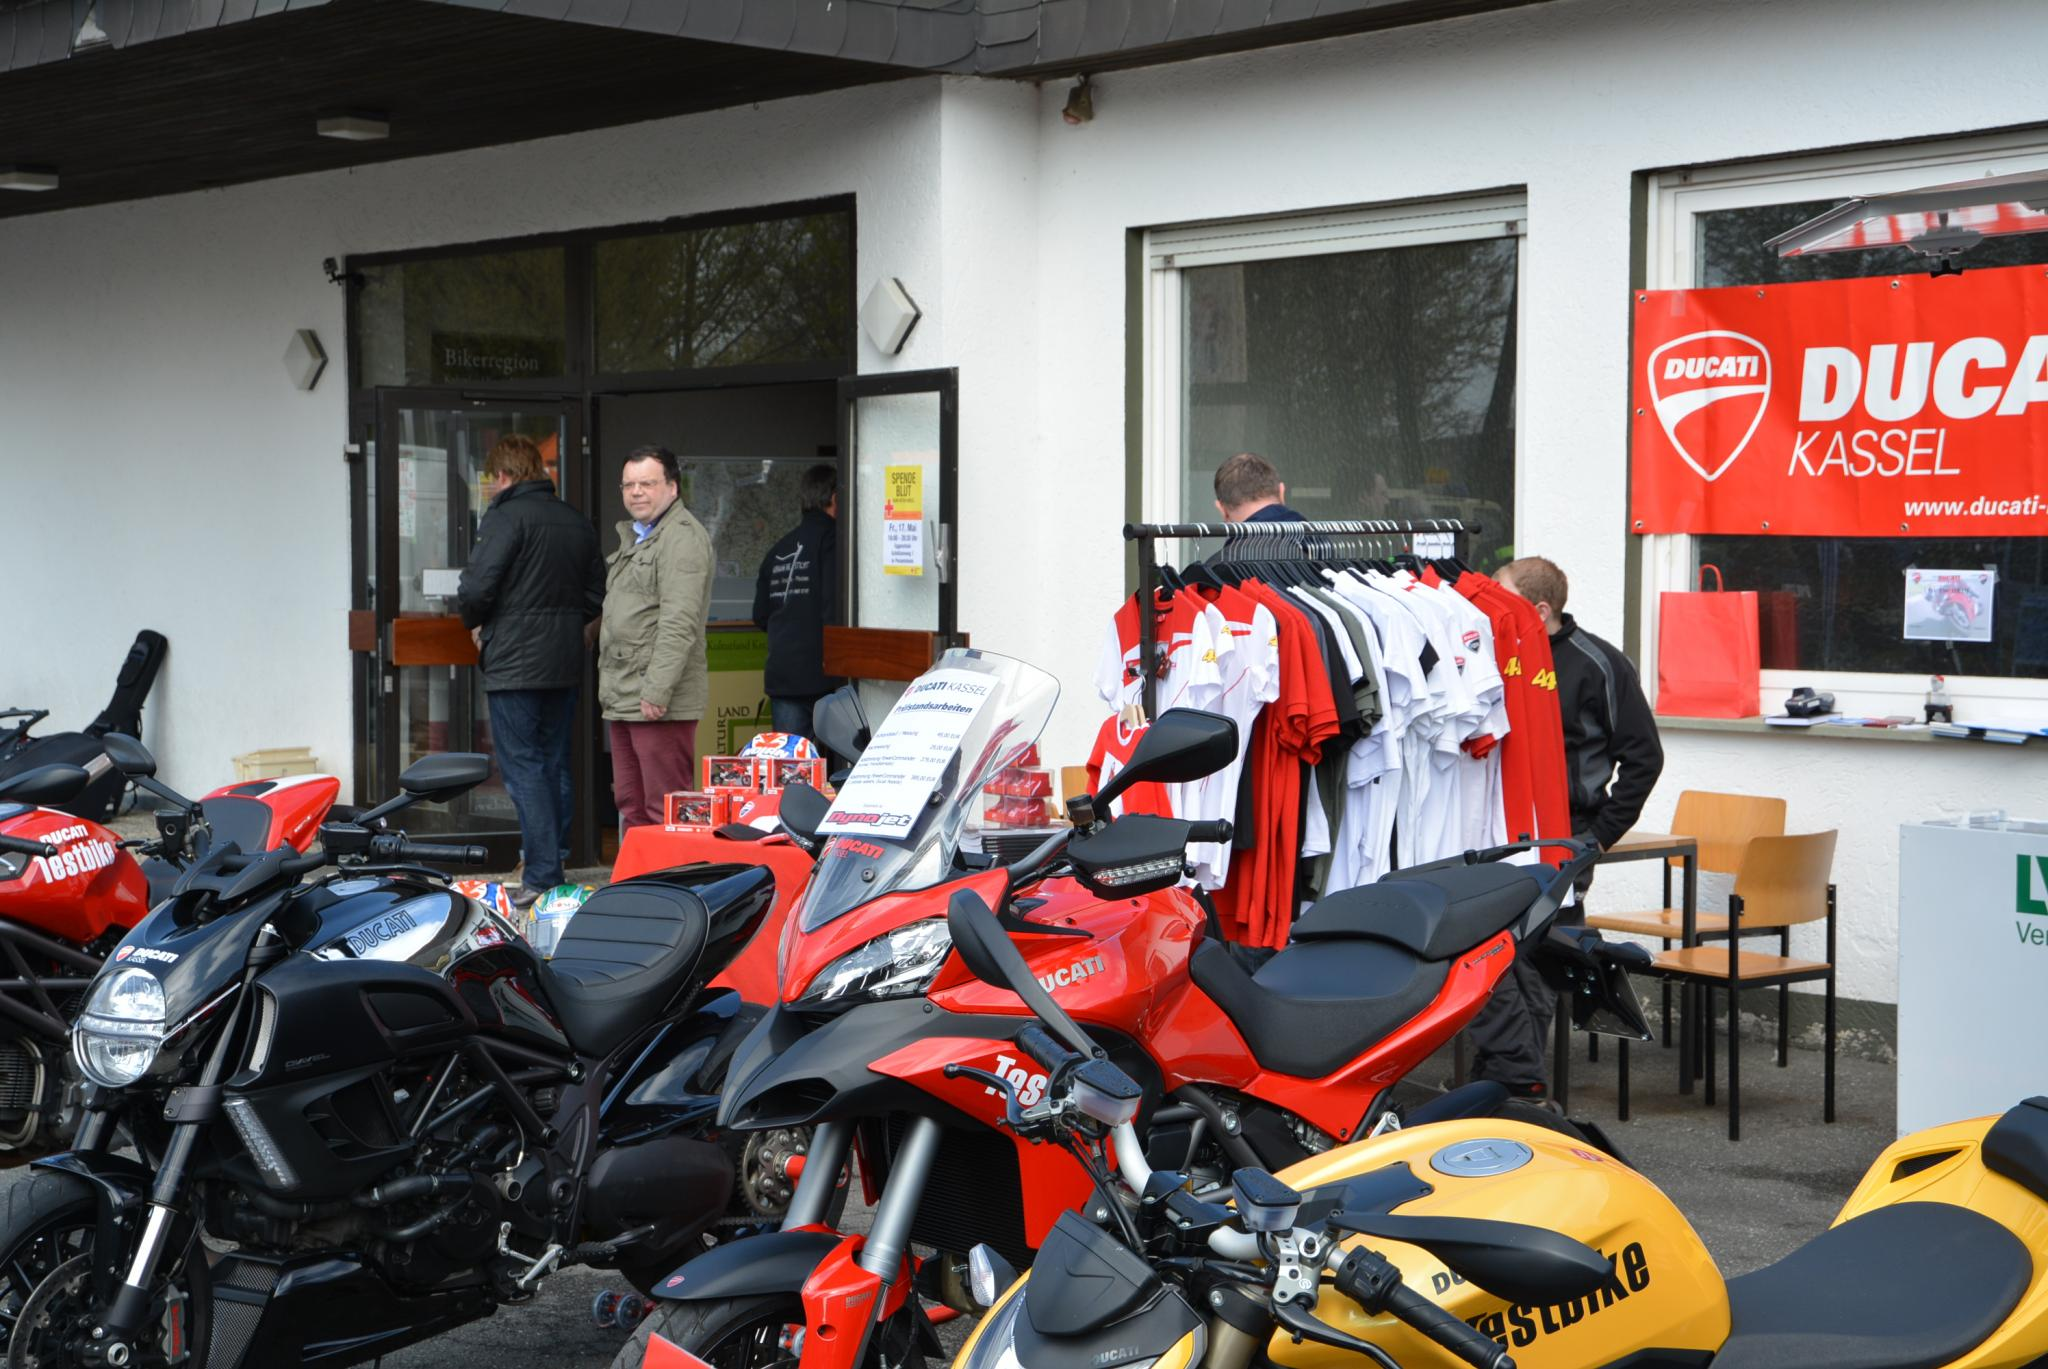 fotos motorrad ducati store kassel 34121 kassel frankfurter str 106 ducati. Black Bedroom Furniture Sets. Home Design Ideas